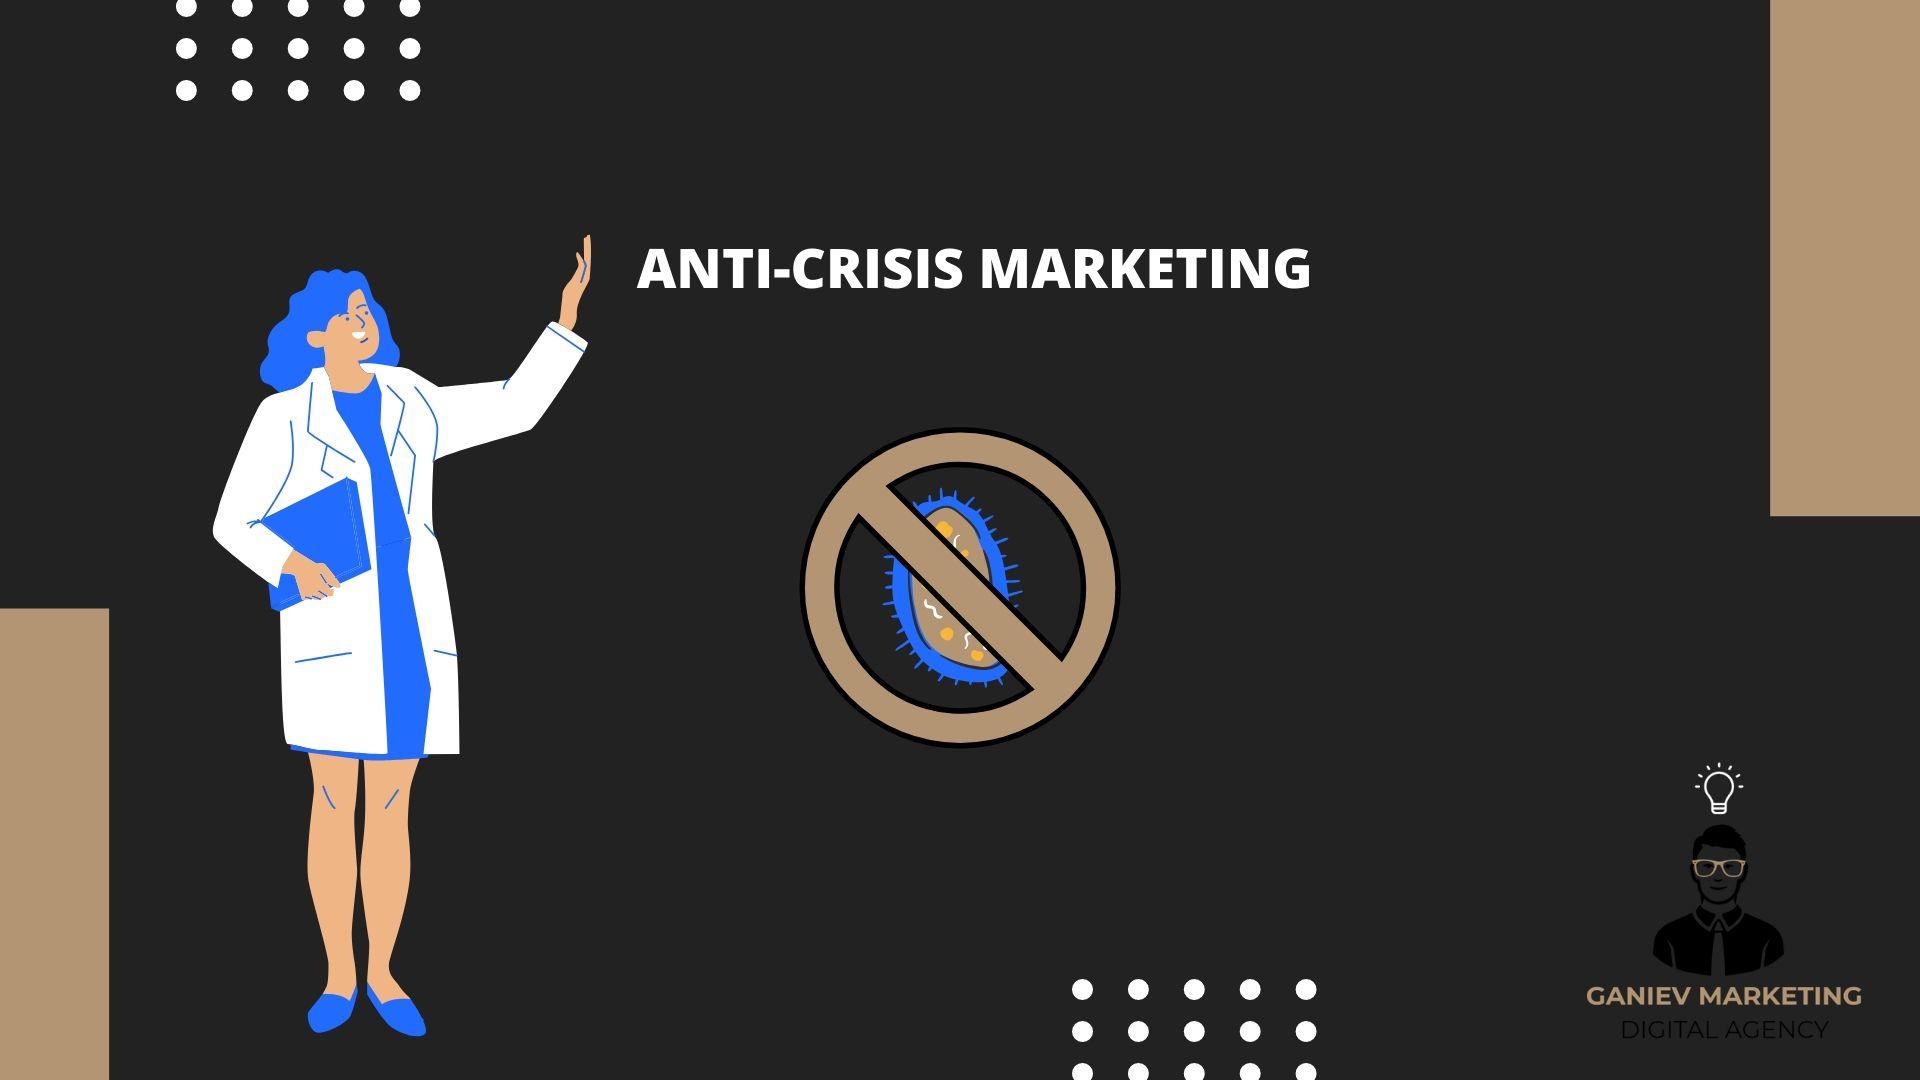 маркетинг во время кризиса